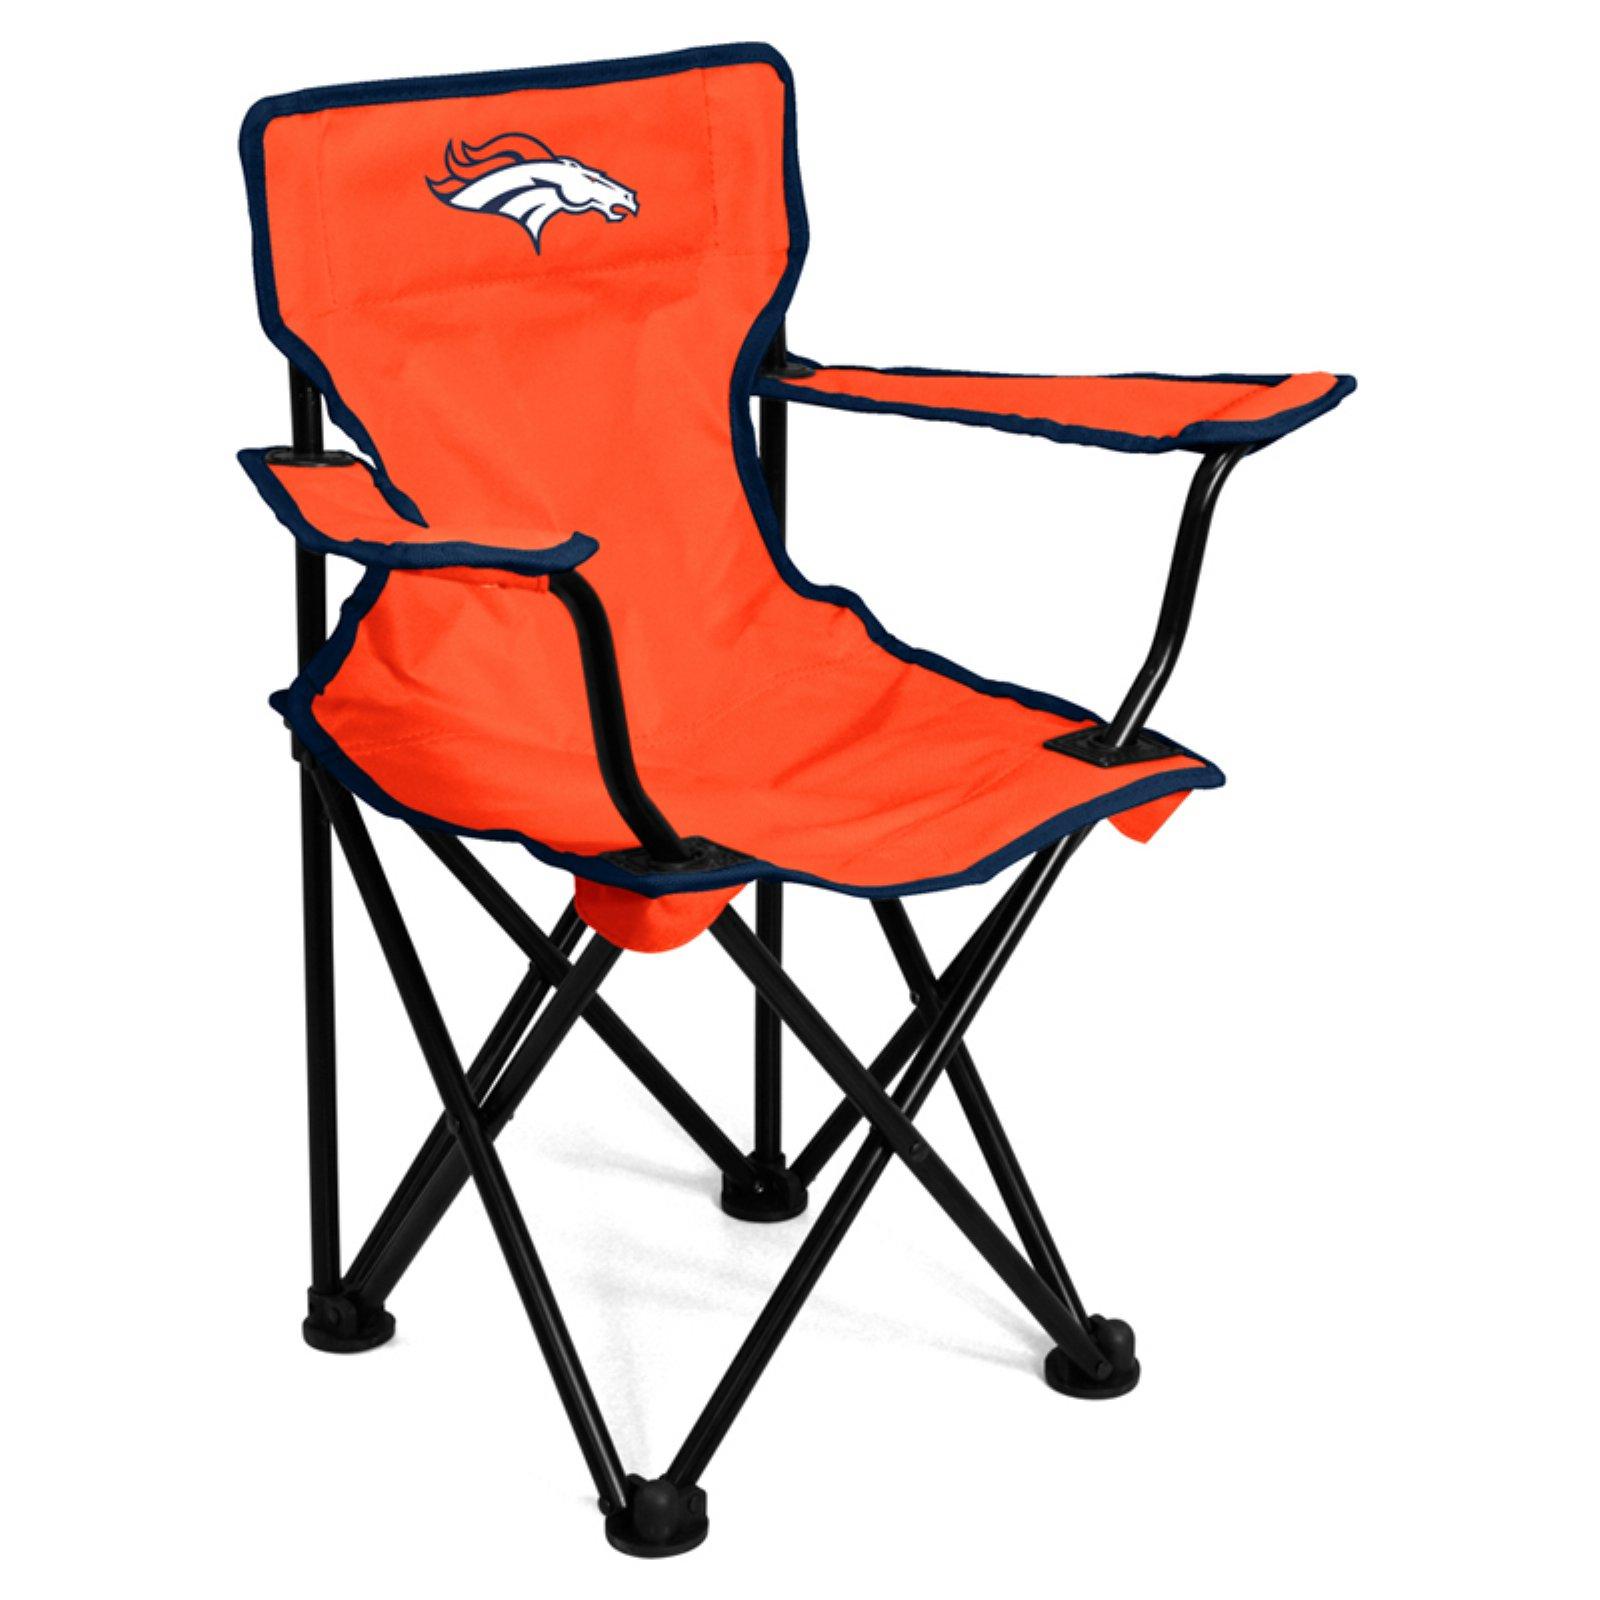 walmart lawn chair folding covers for sale logo brands nfl toddler outdoor com 6b4fcc73 33ed 4ef0 bd77 2eec28d3bb78 1 e0eee42aa8fe30acd8913c835607619d jpeg odnheight 450 odnwidth odnbg ffffff